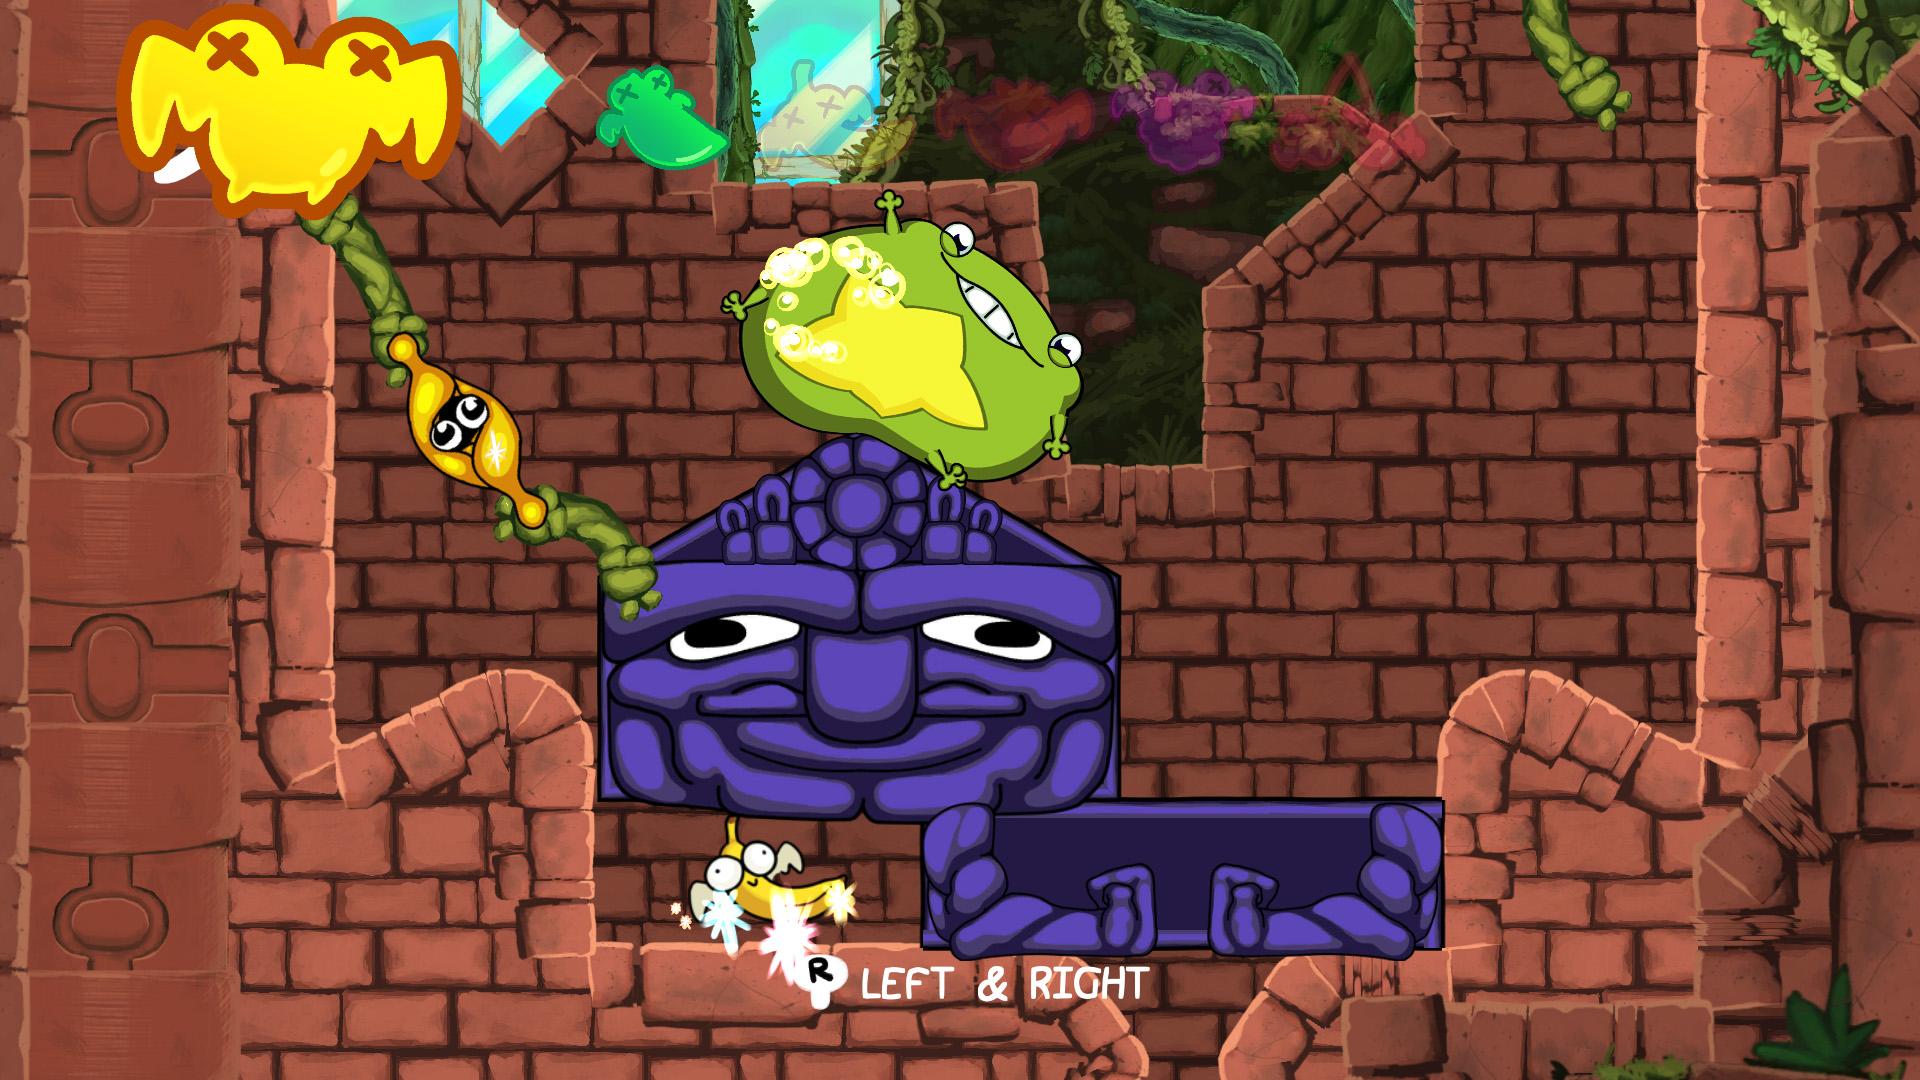 Pump the Frog screen_1920x1080_2018-11-22_11-33-35.jpg